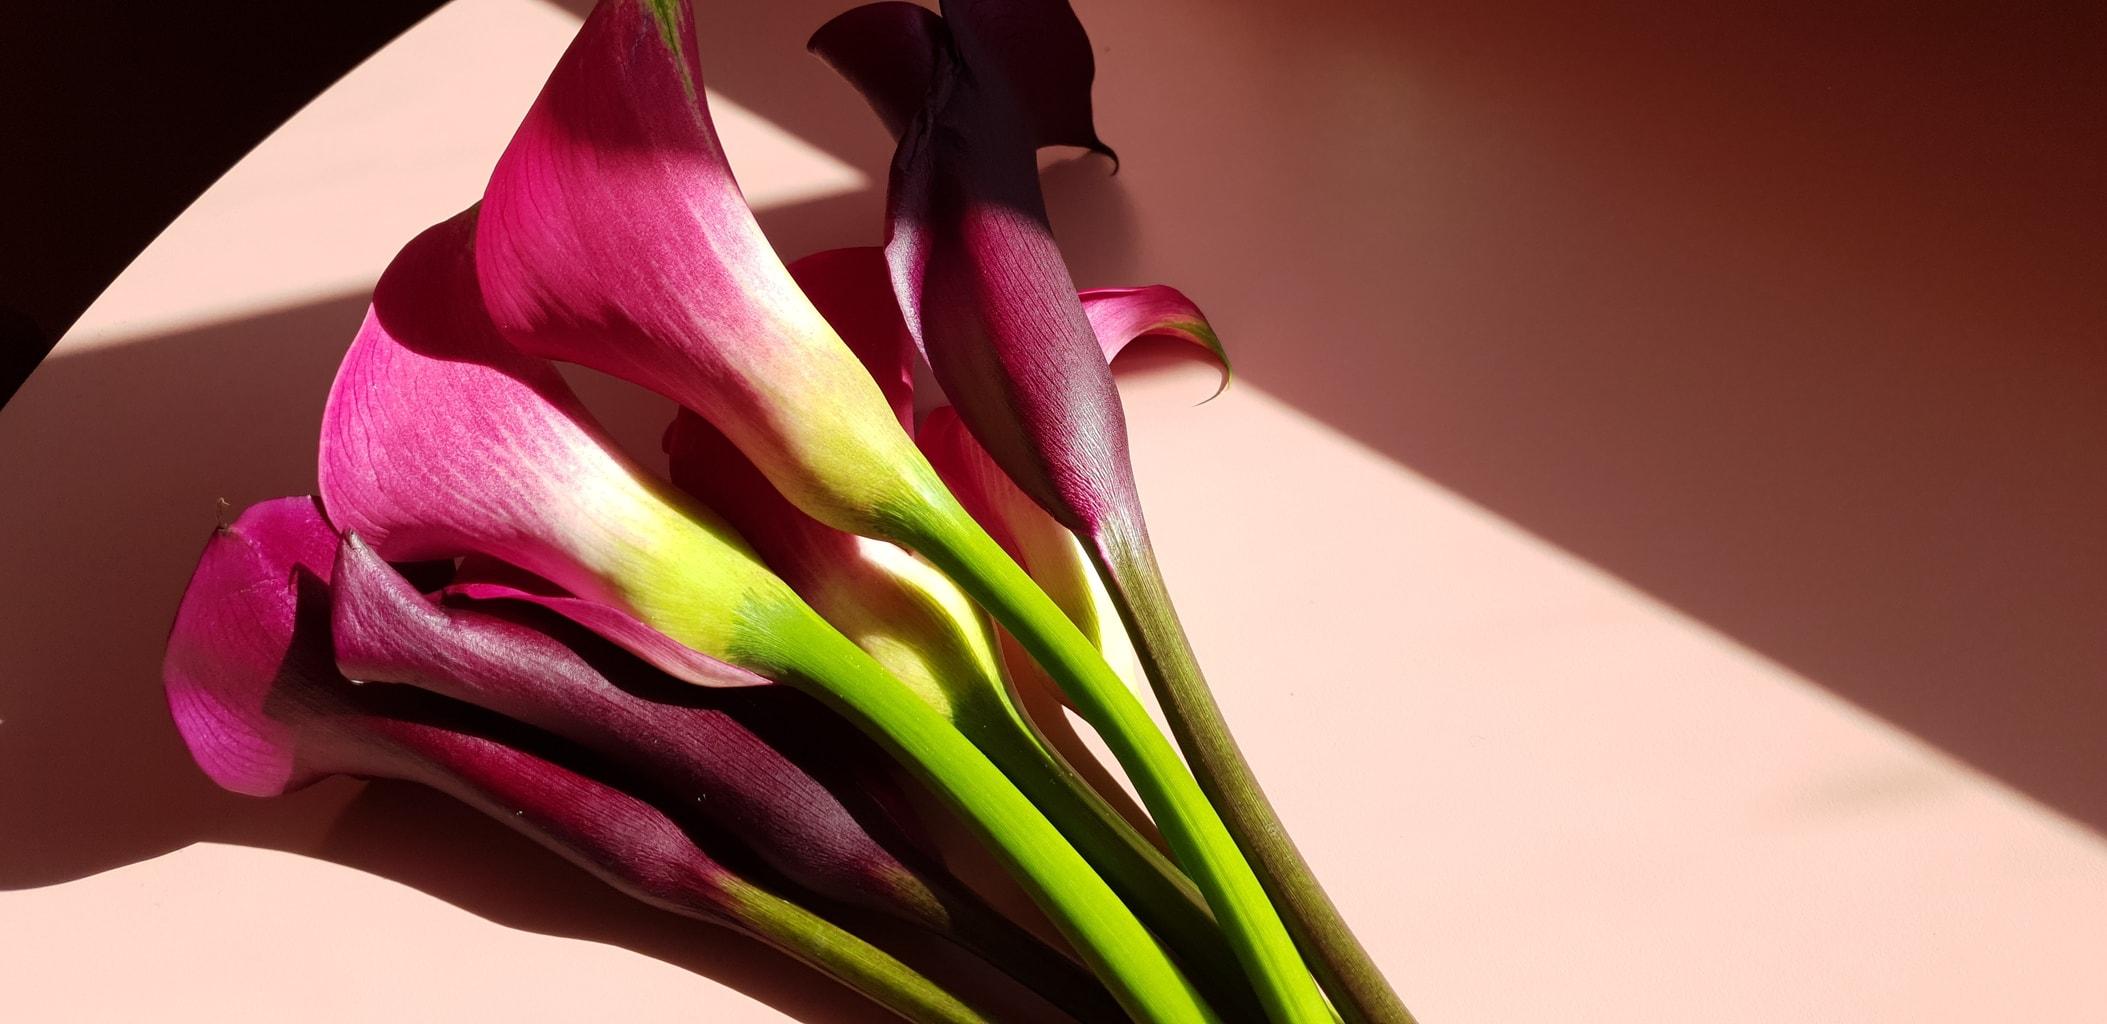 Flores capturadas con un Samsung Galaxy S9